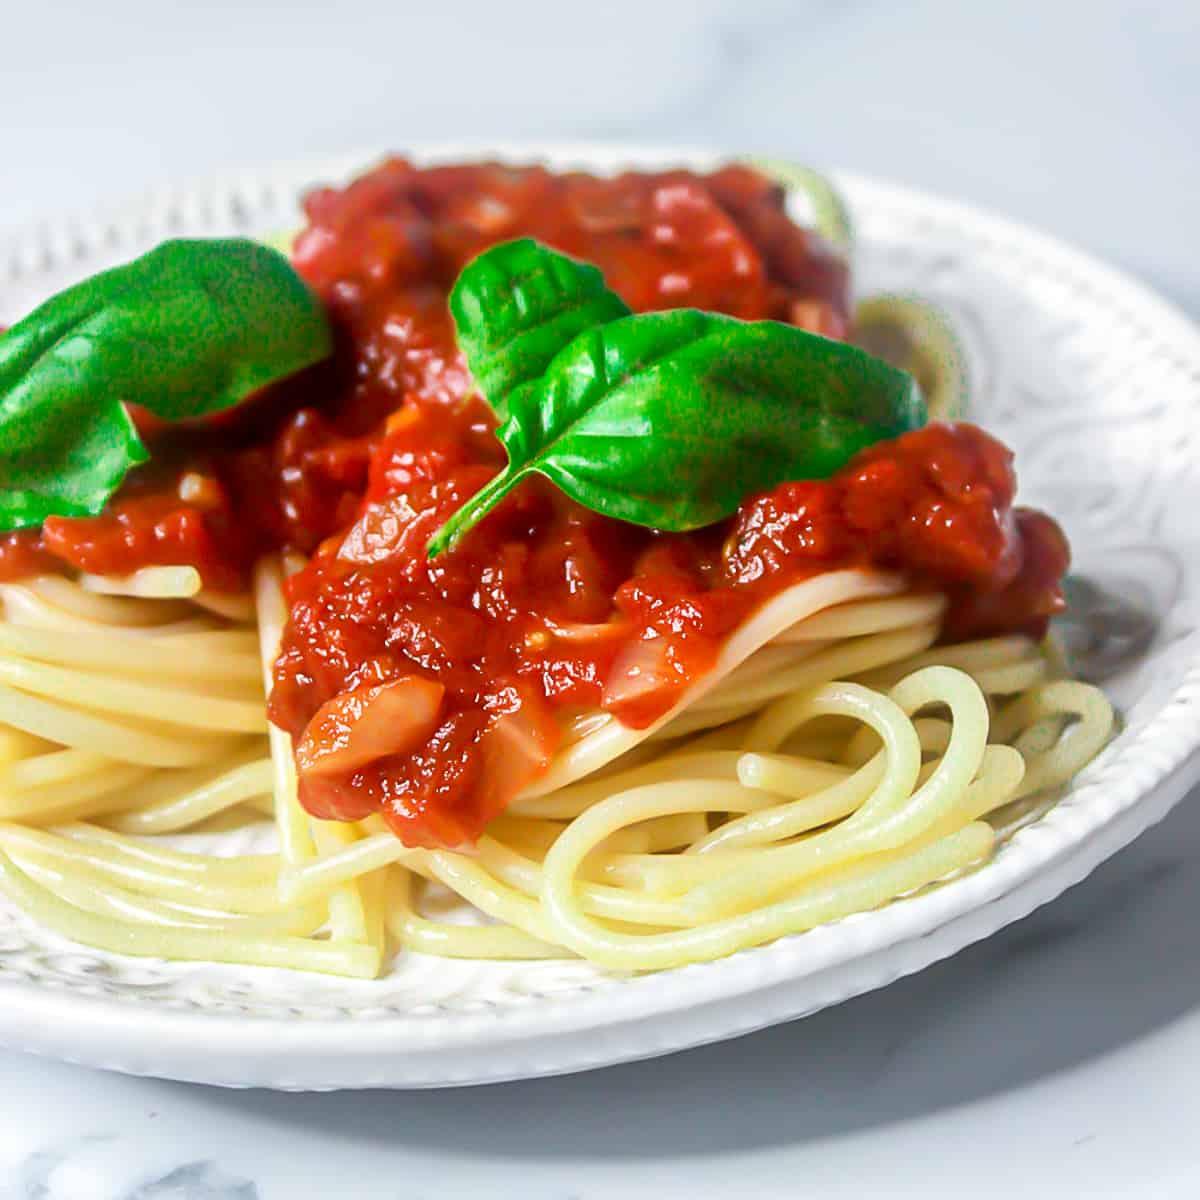 Fresh homemade pasta sauce on spaghetti with basil.